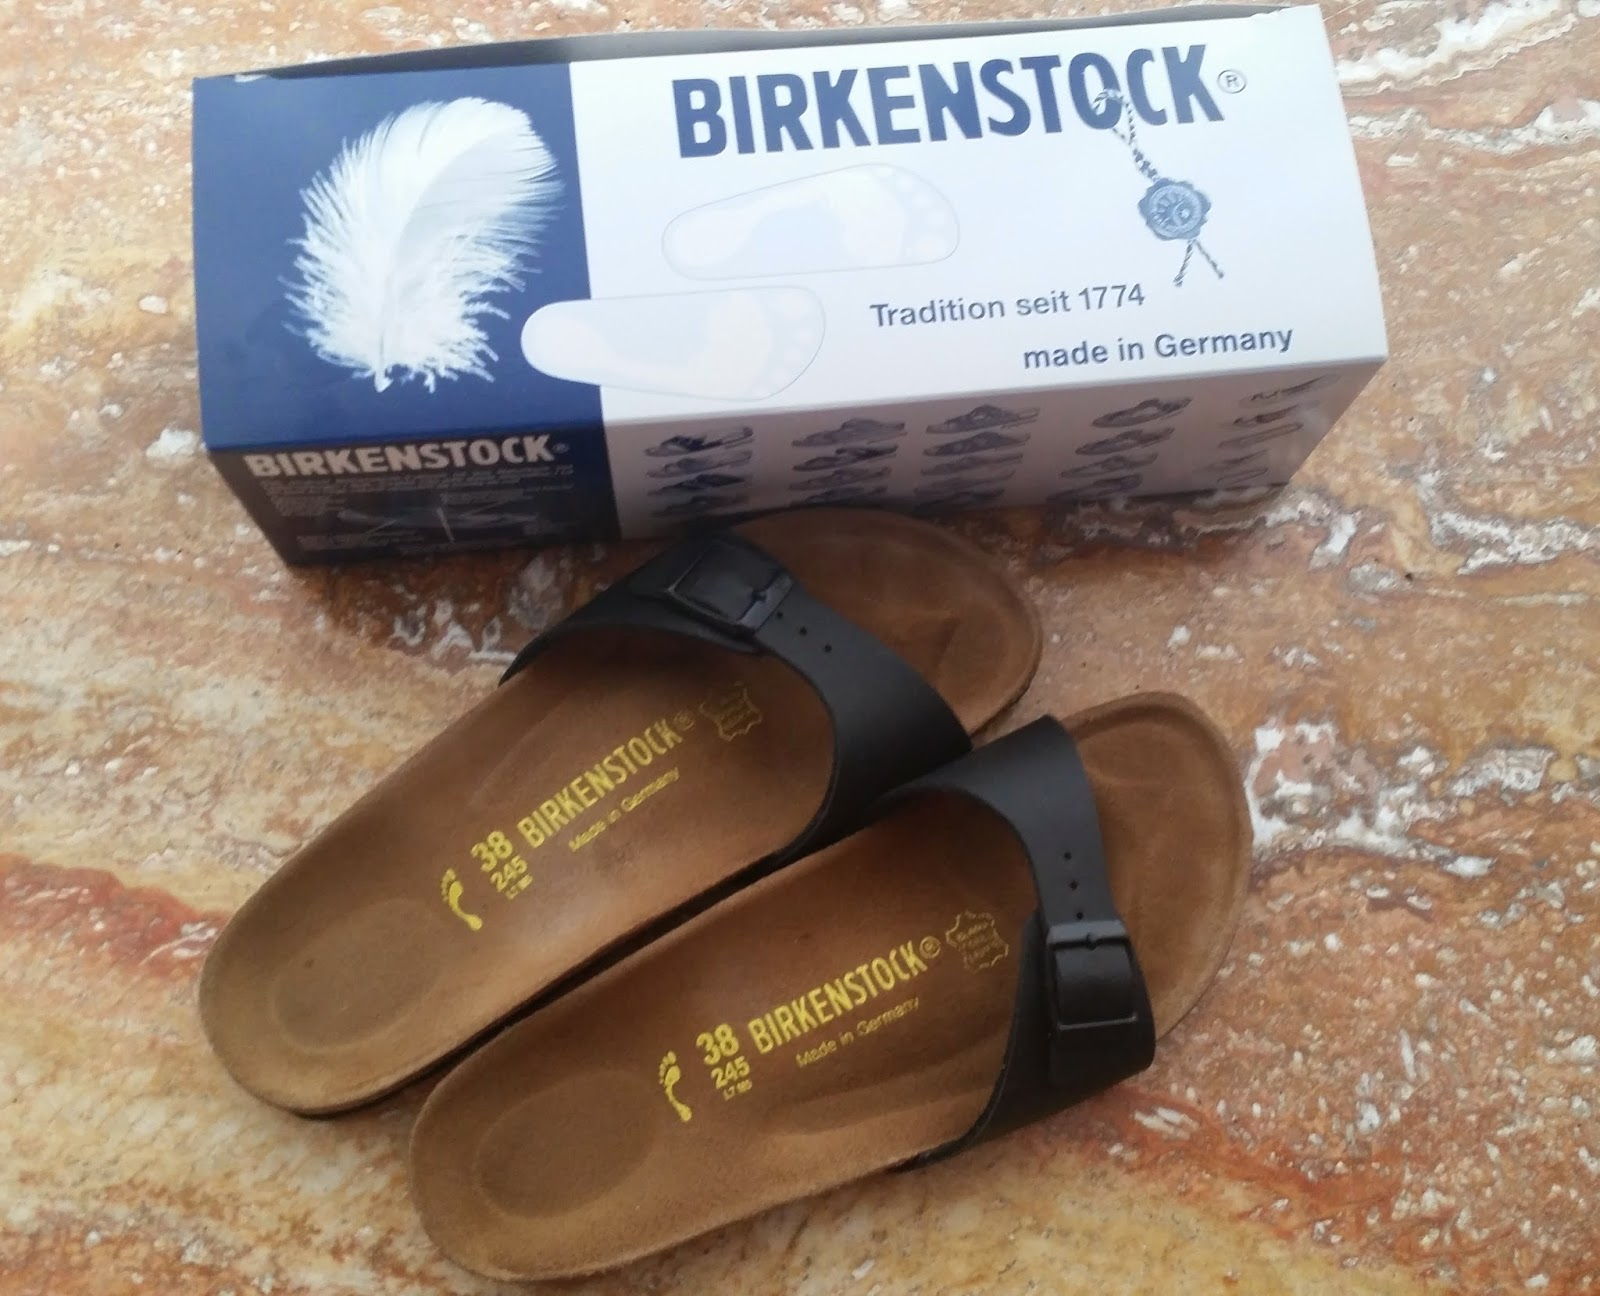 Birkenstock - Madrid - www.annitschkasblog.de